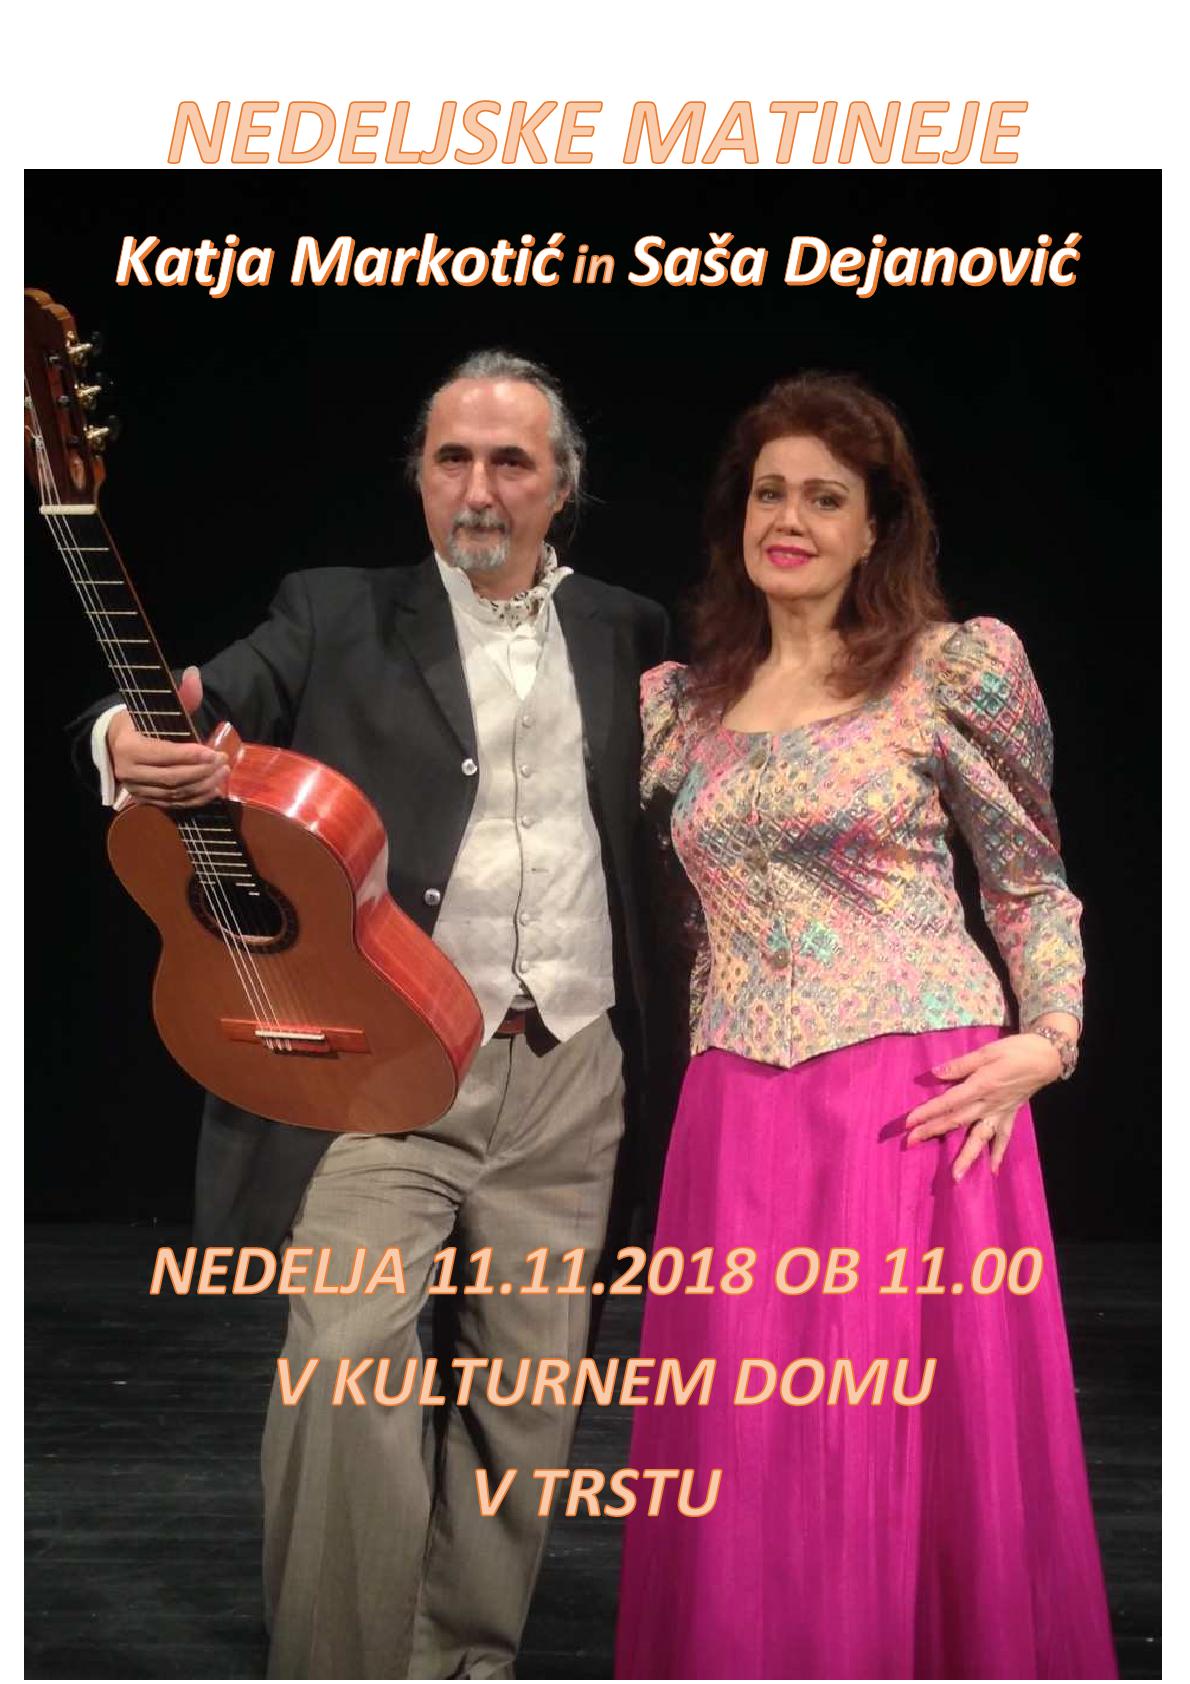 11.11.2018 ob 11.00 uri -GLASBENE MATINEJE- Katja Markotić in Saša Dejanović